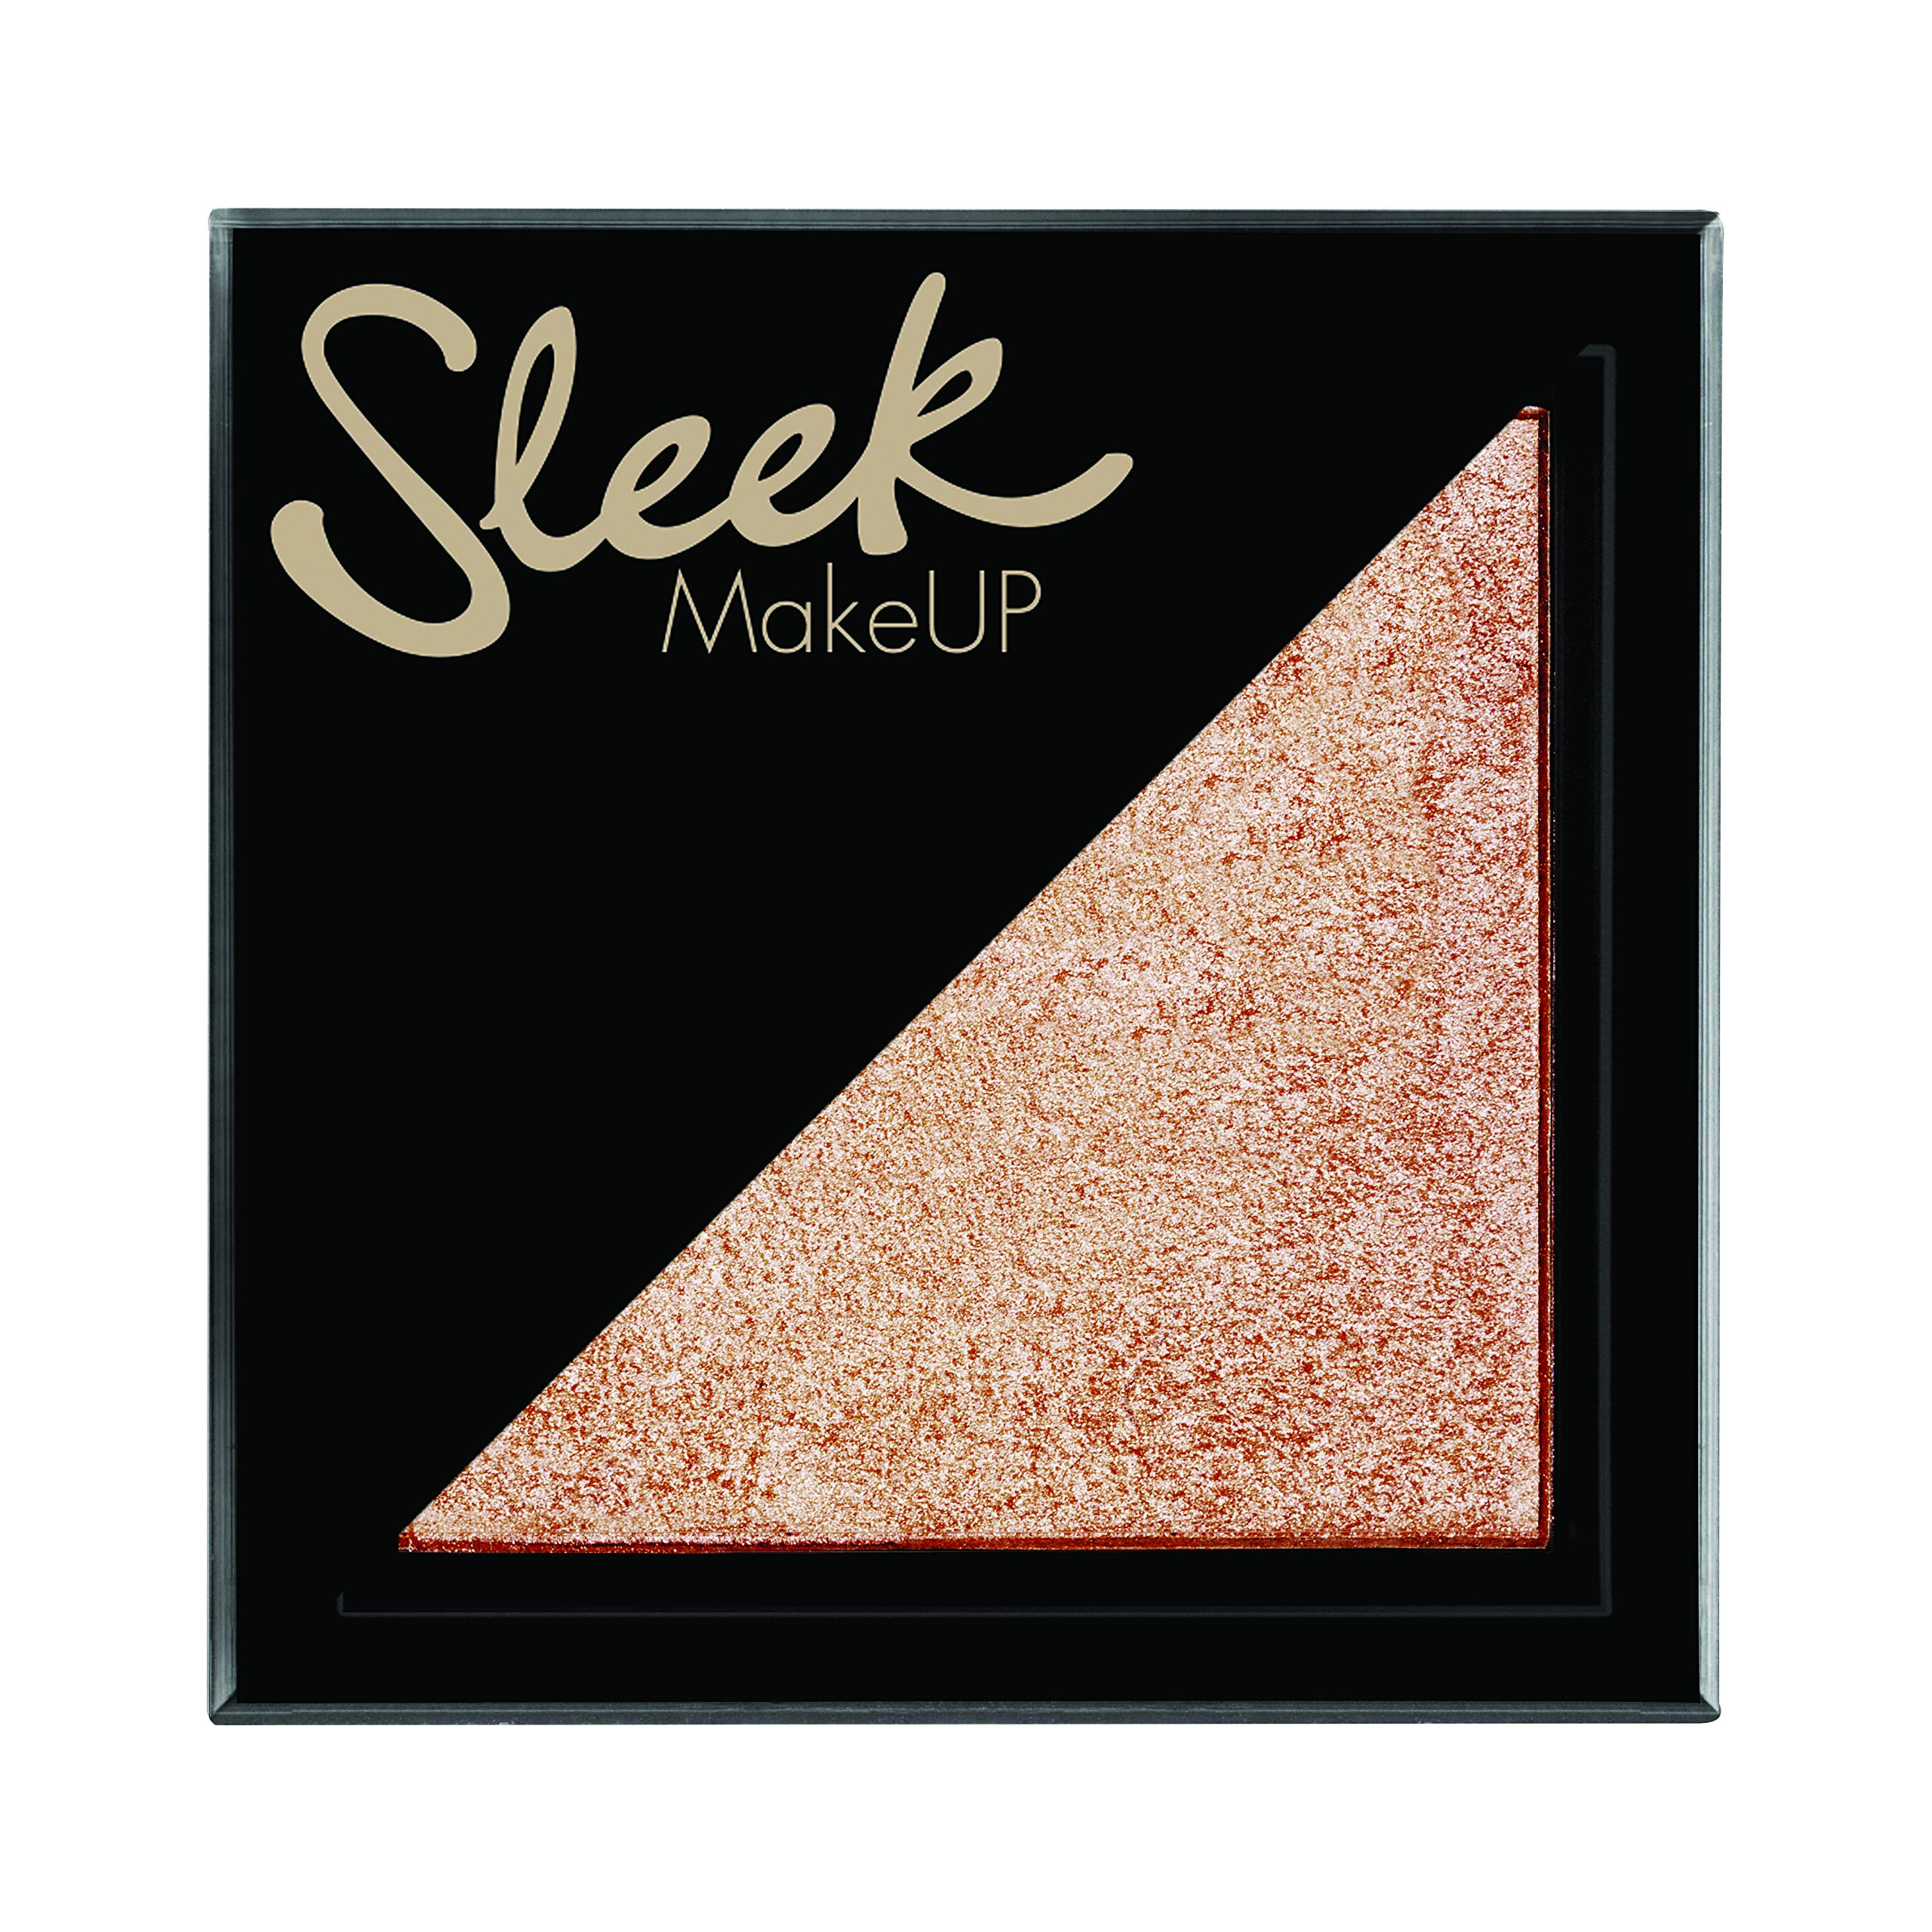 Sleek MakeUP Mono Highlighter, Award Winning Shades, Lightweight, Long Lasting, Not Tested on Animals, Cleo's Kiss Sphinx, 7g